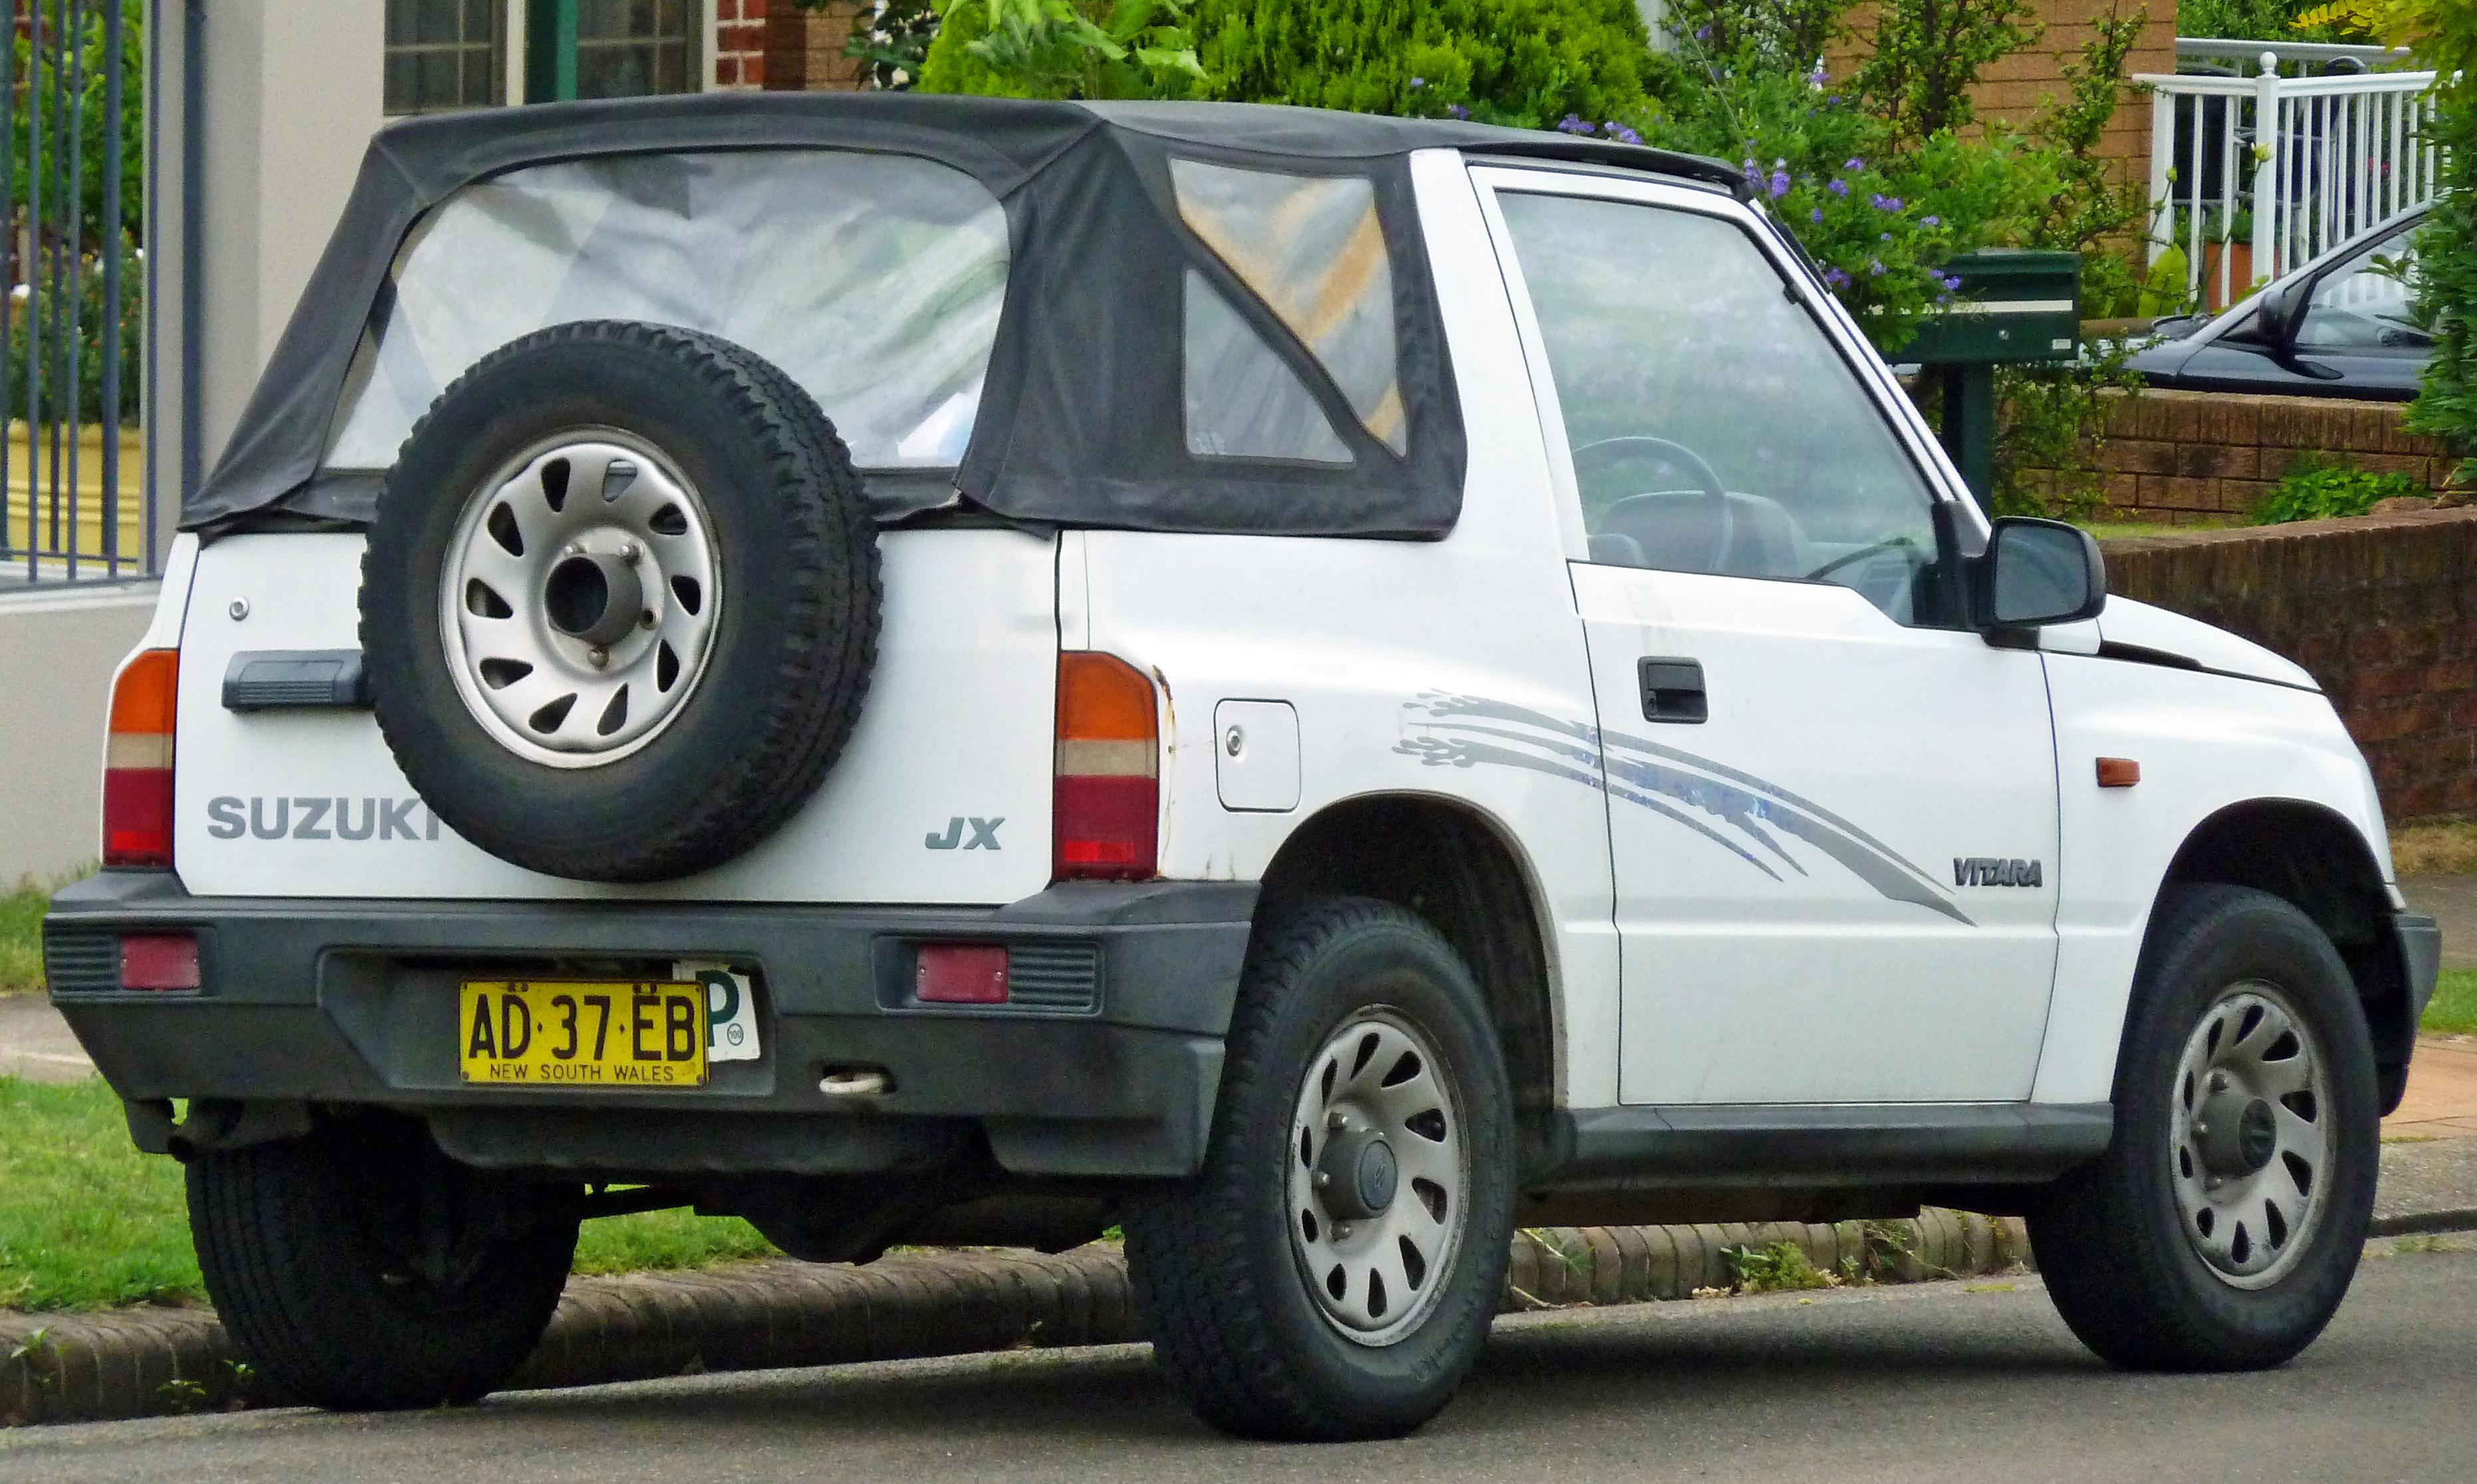 Suzuki 20Sidekick likewise 854 Suzuki Vitara 1998 Wallpaper 3 in addition 854 Suzuki Vitara 1998 Wallpaper 3 besides 1461334 besides 87 Suzuki Samurai Wiring Diagram. on 1992 suzuki sidekick jx